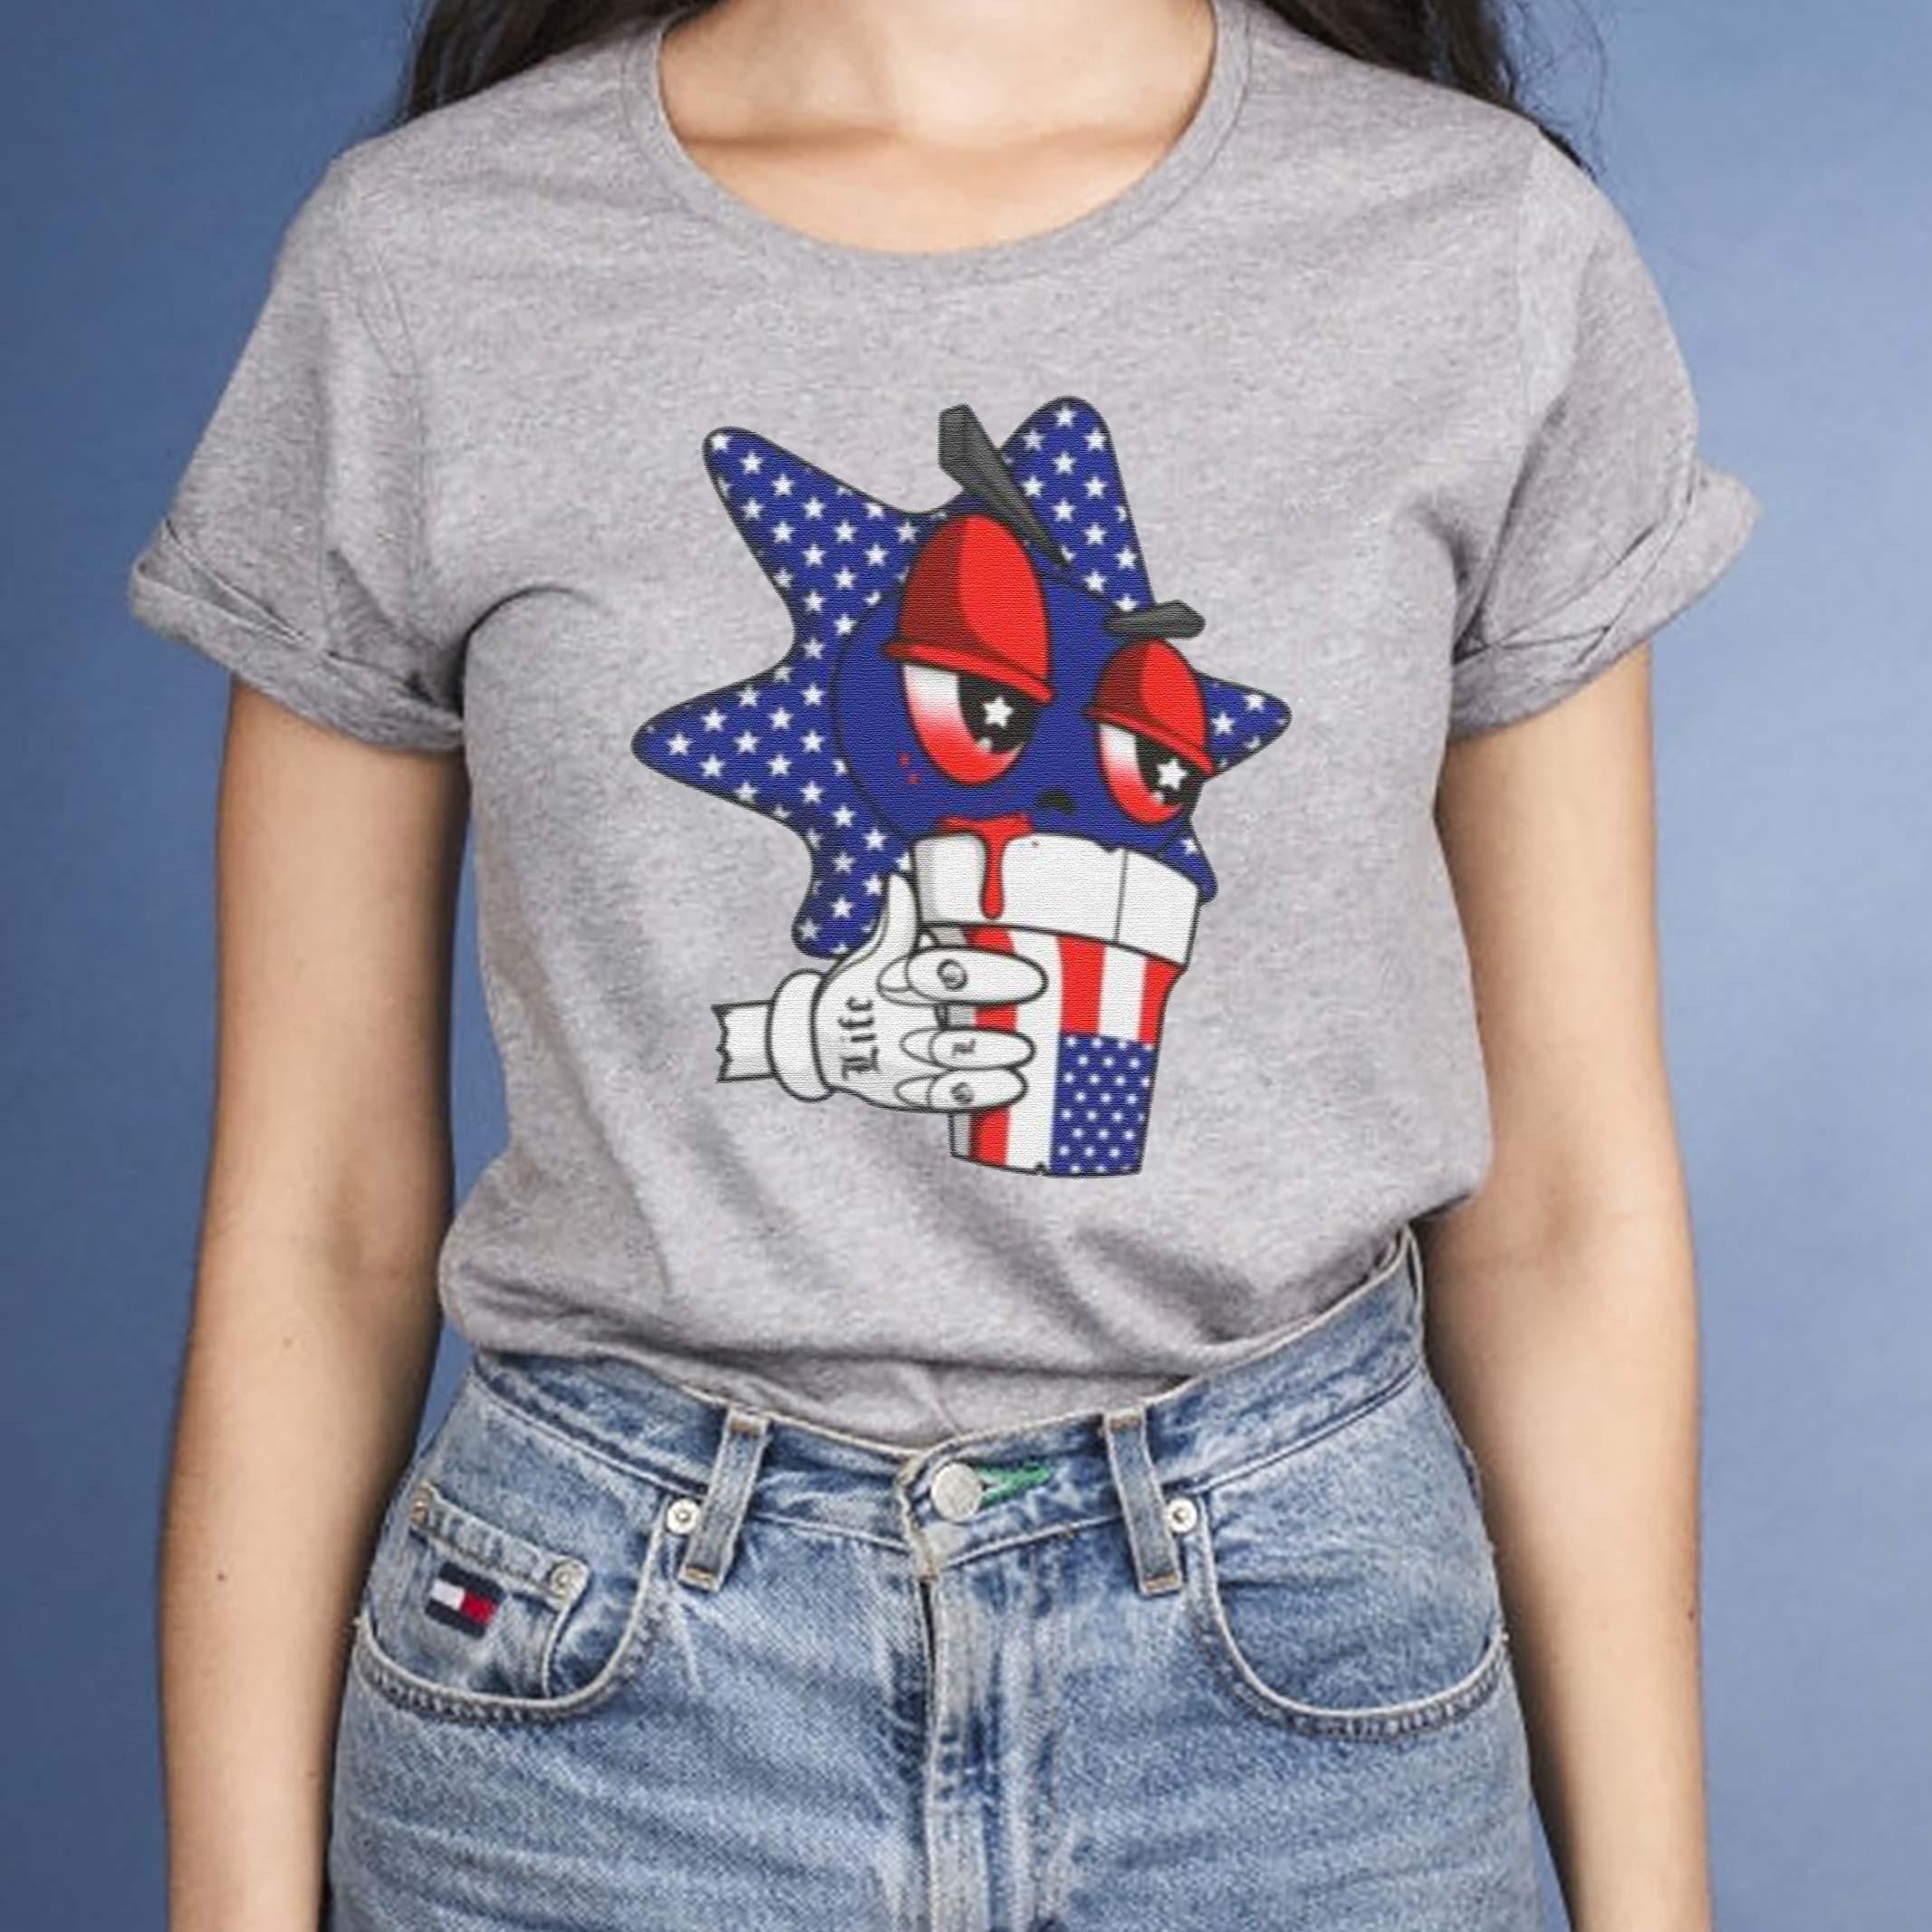 Glo-Gang-T-Shirts